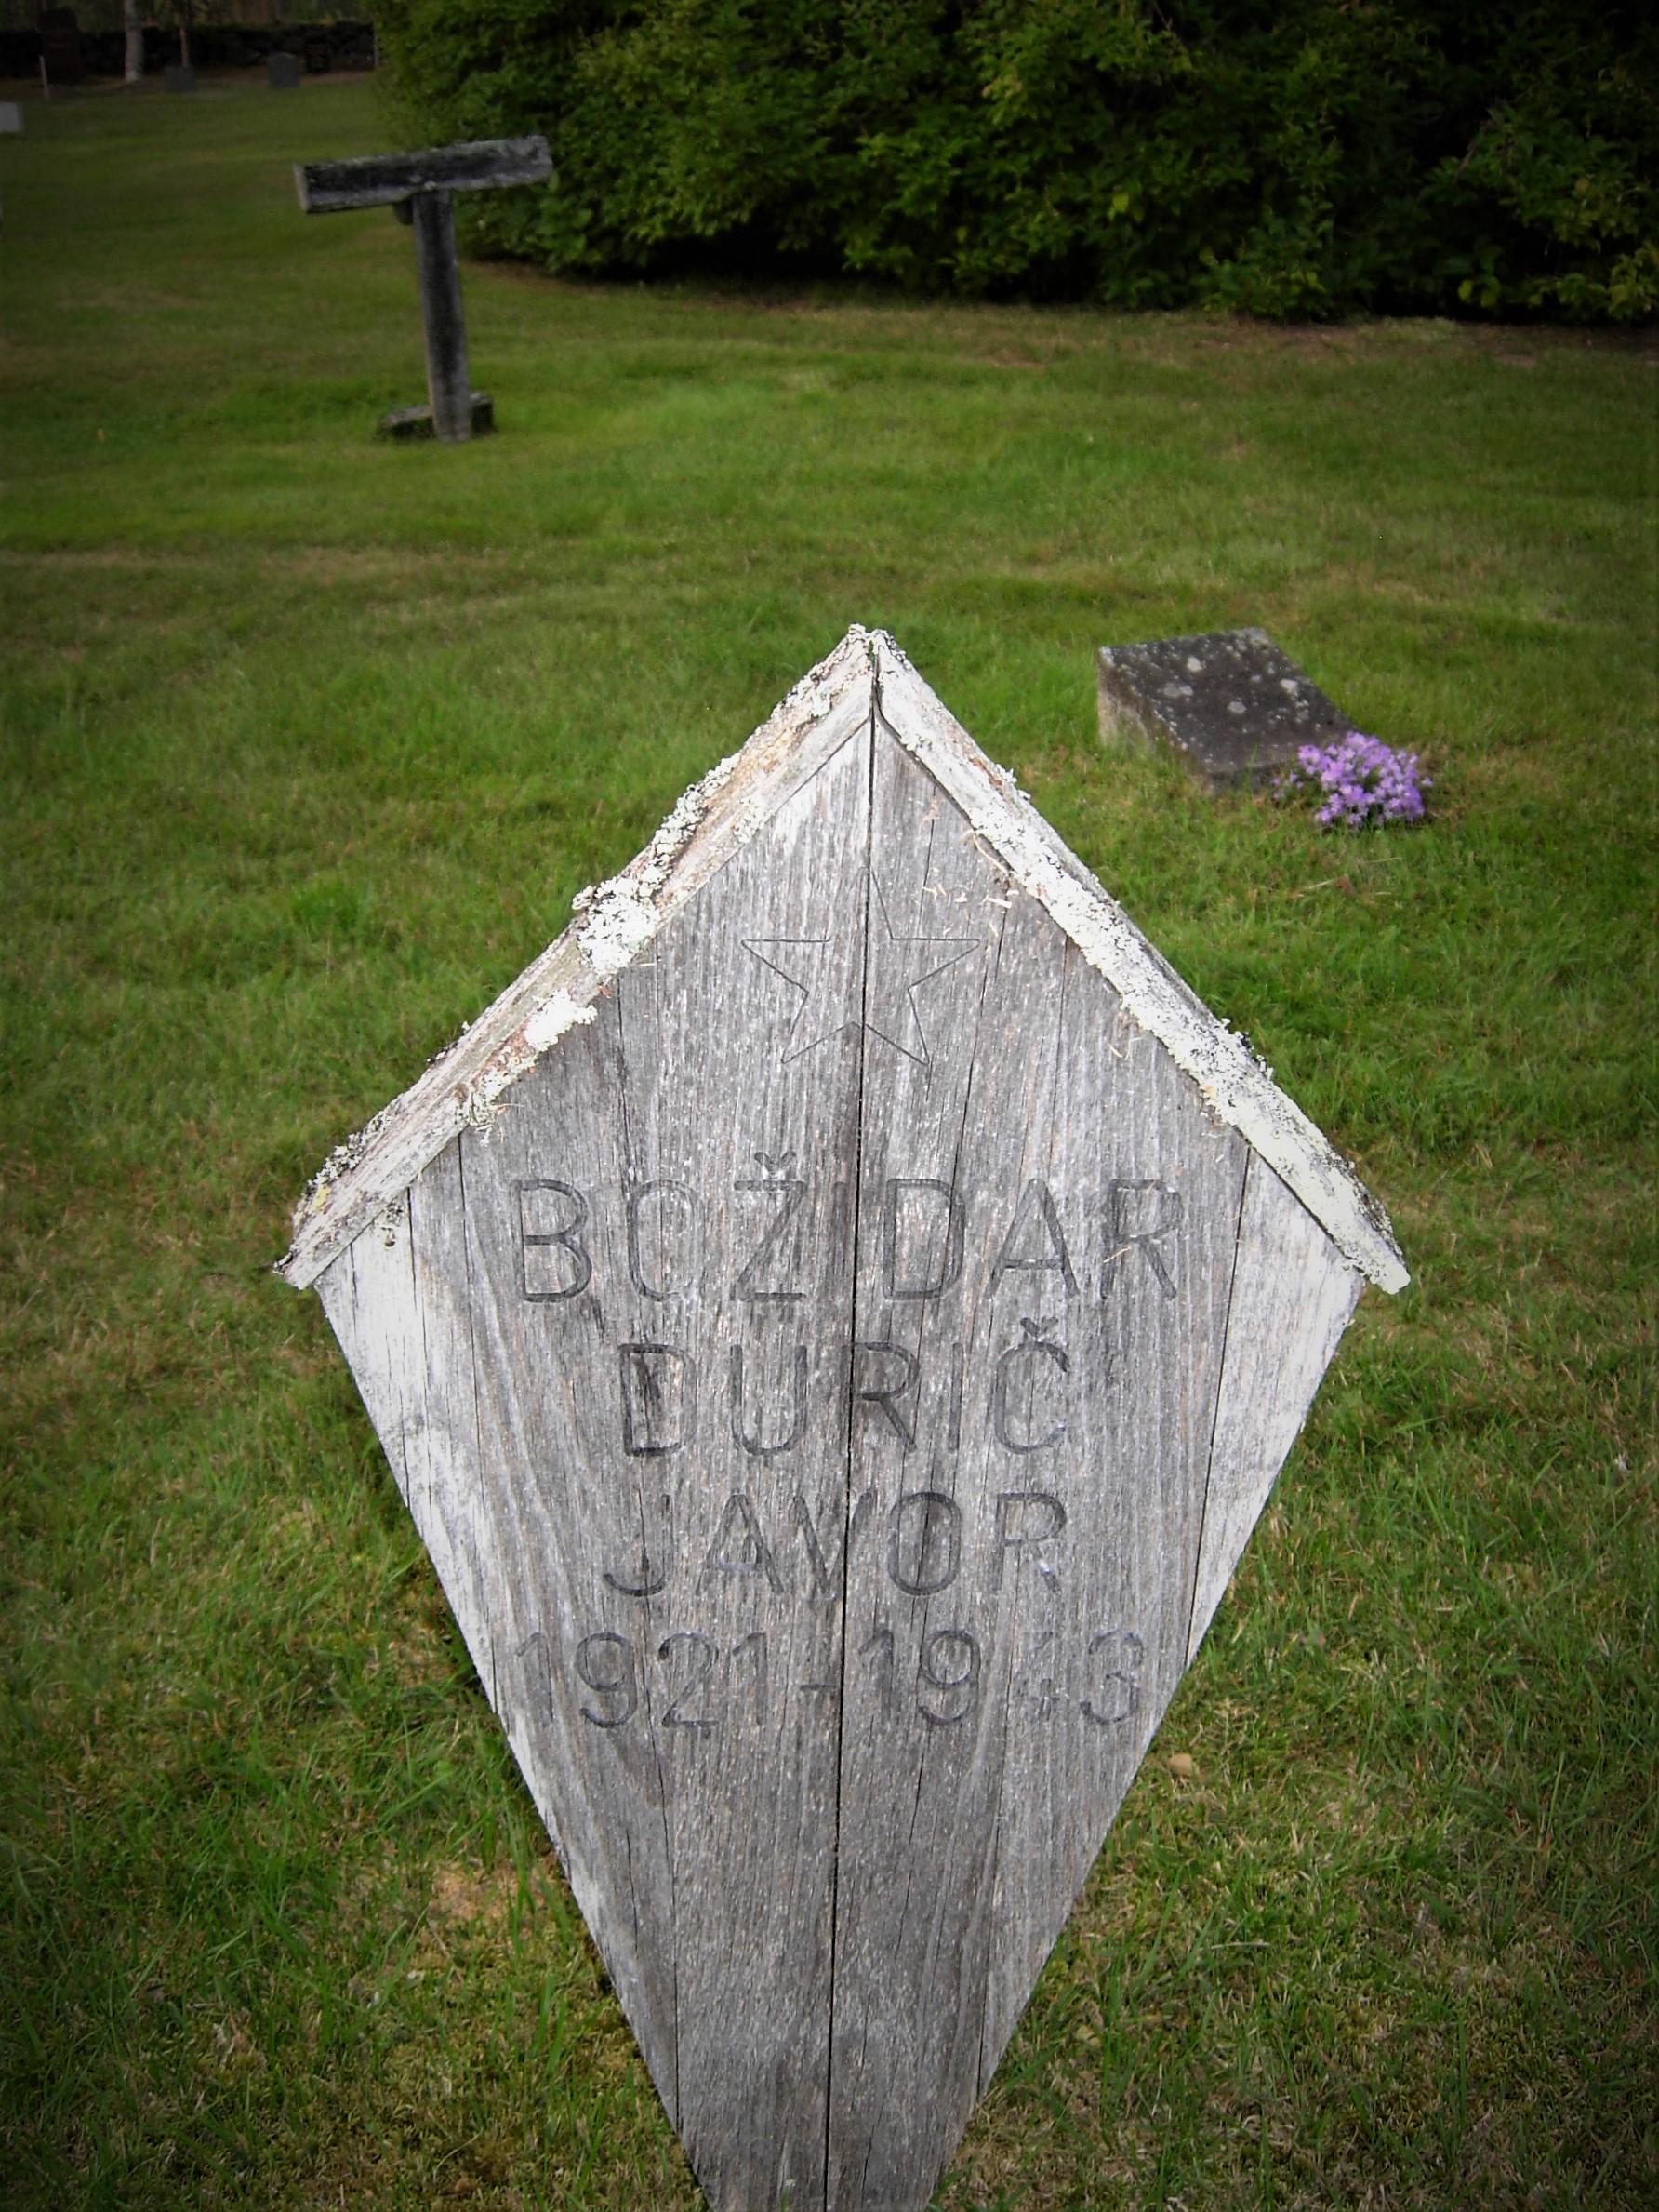 Rysk krigsfange begravs i arjeplog